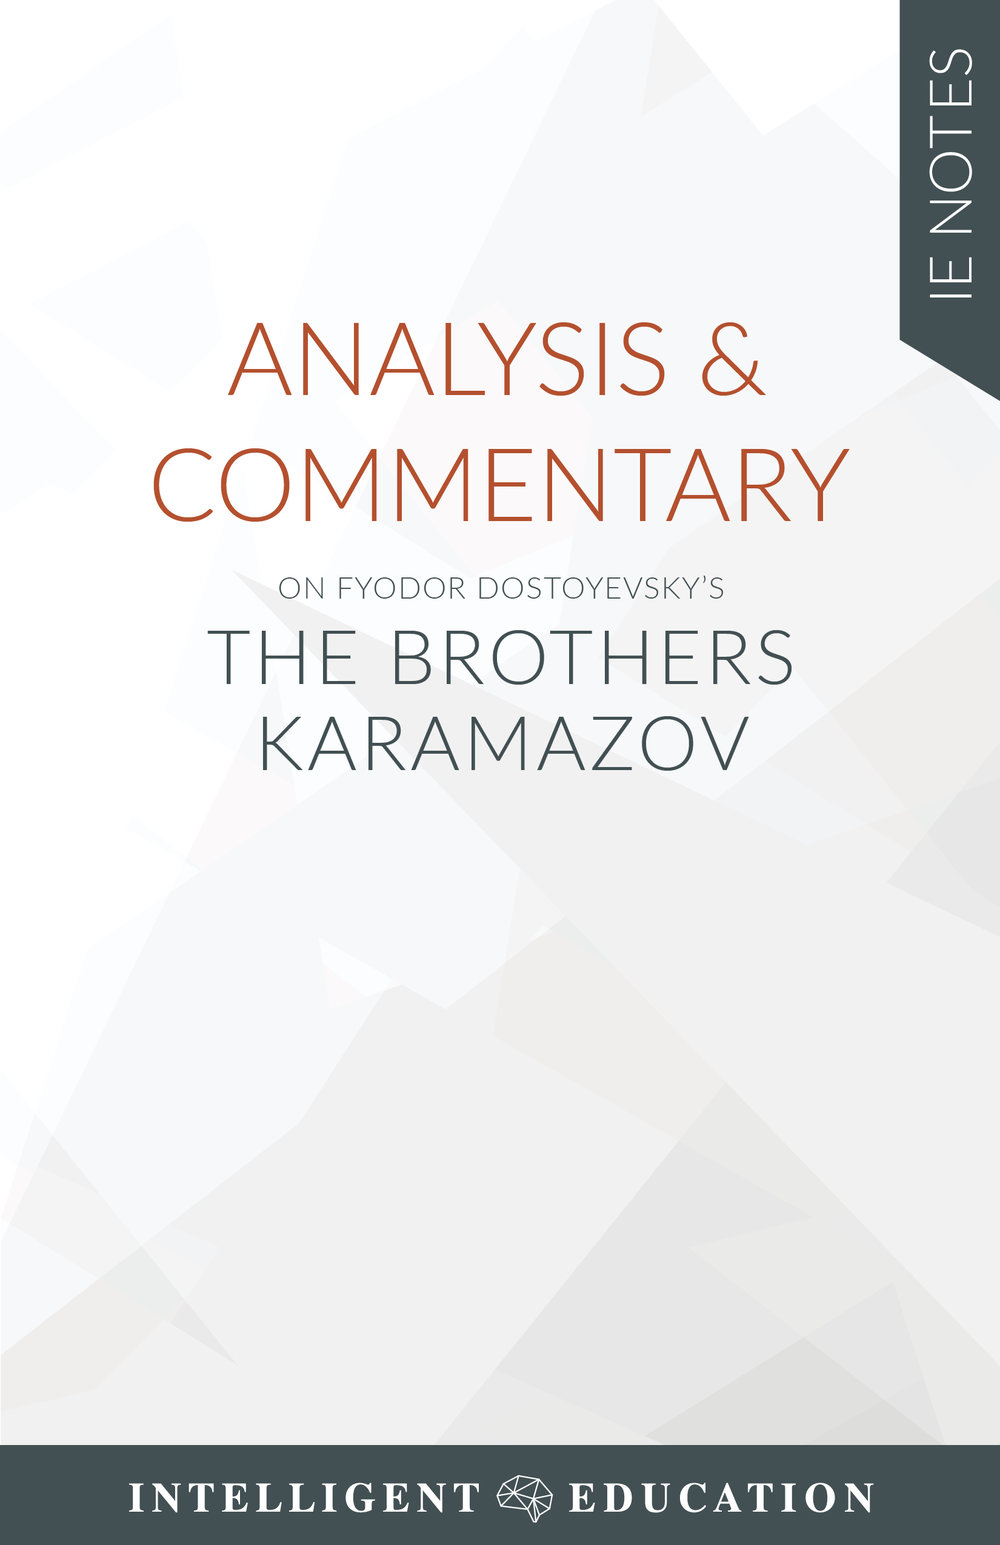 the-brothers-karamazov.jpg